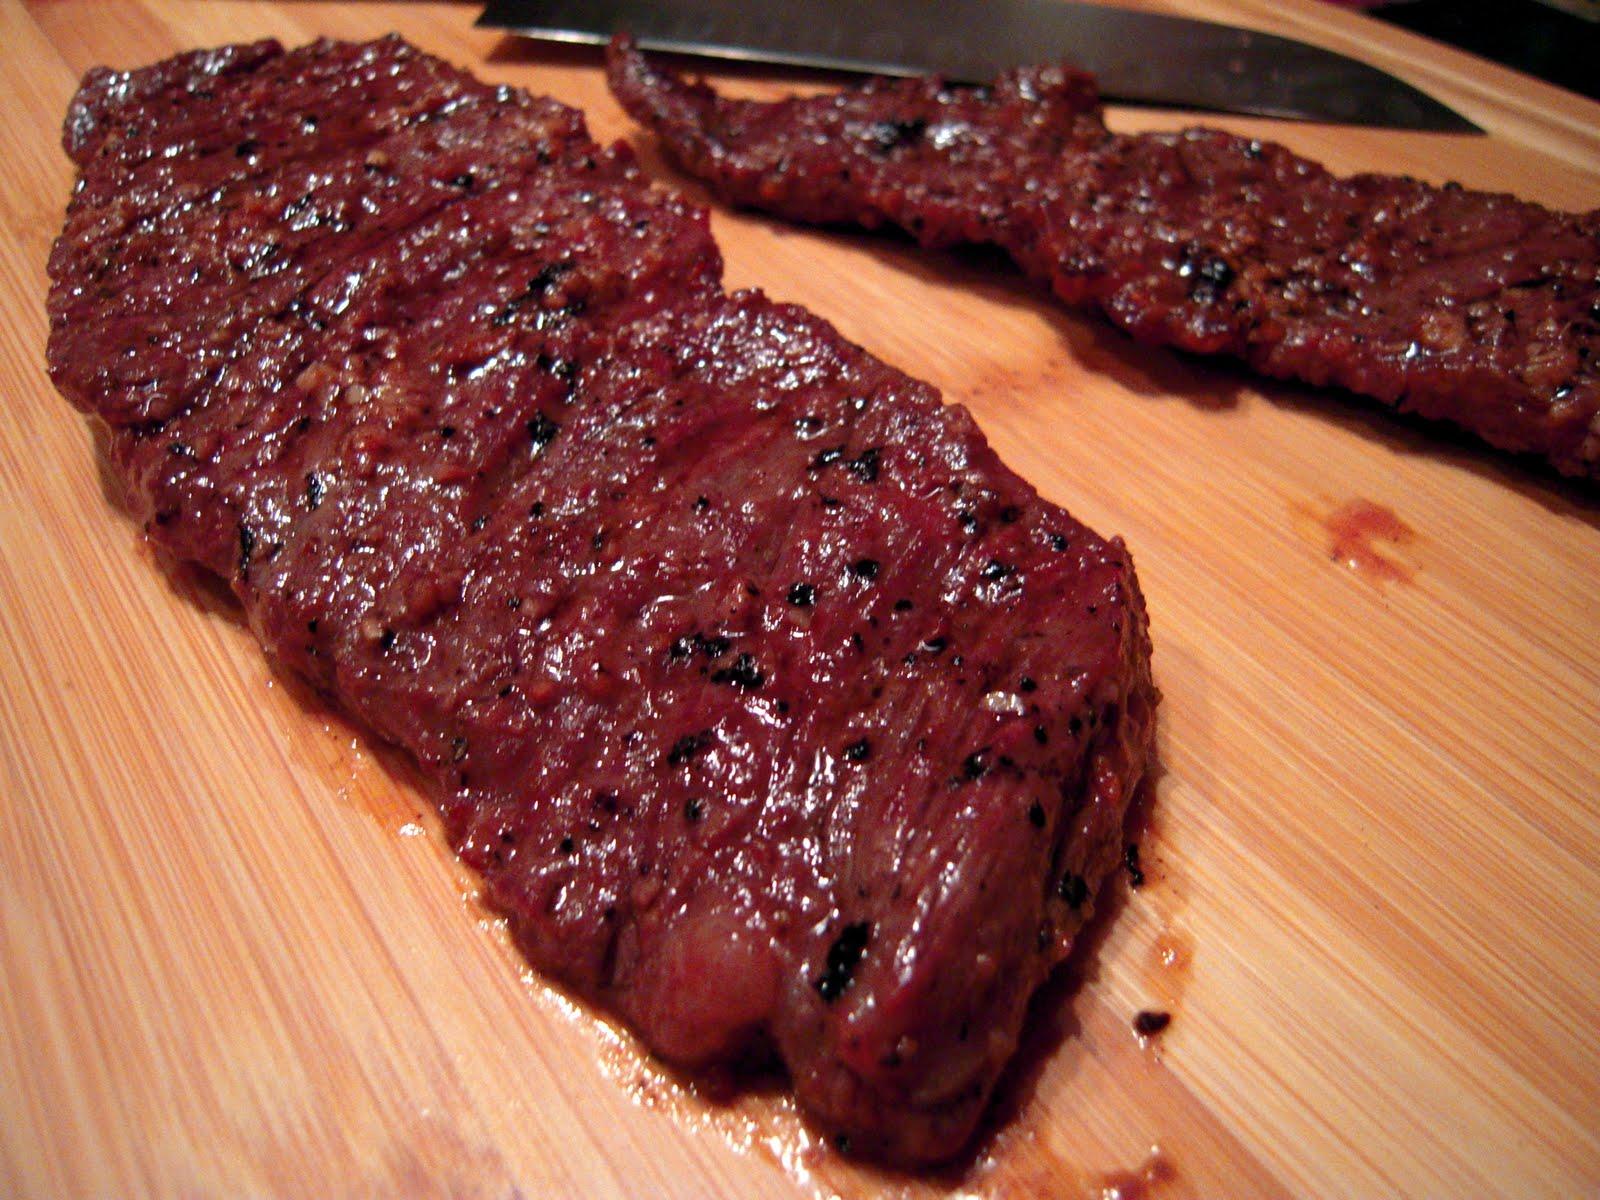 Garlic Skirt Steakgarlic Steak The Most Flavorful And Tender We Ve Ever